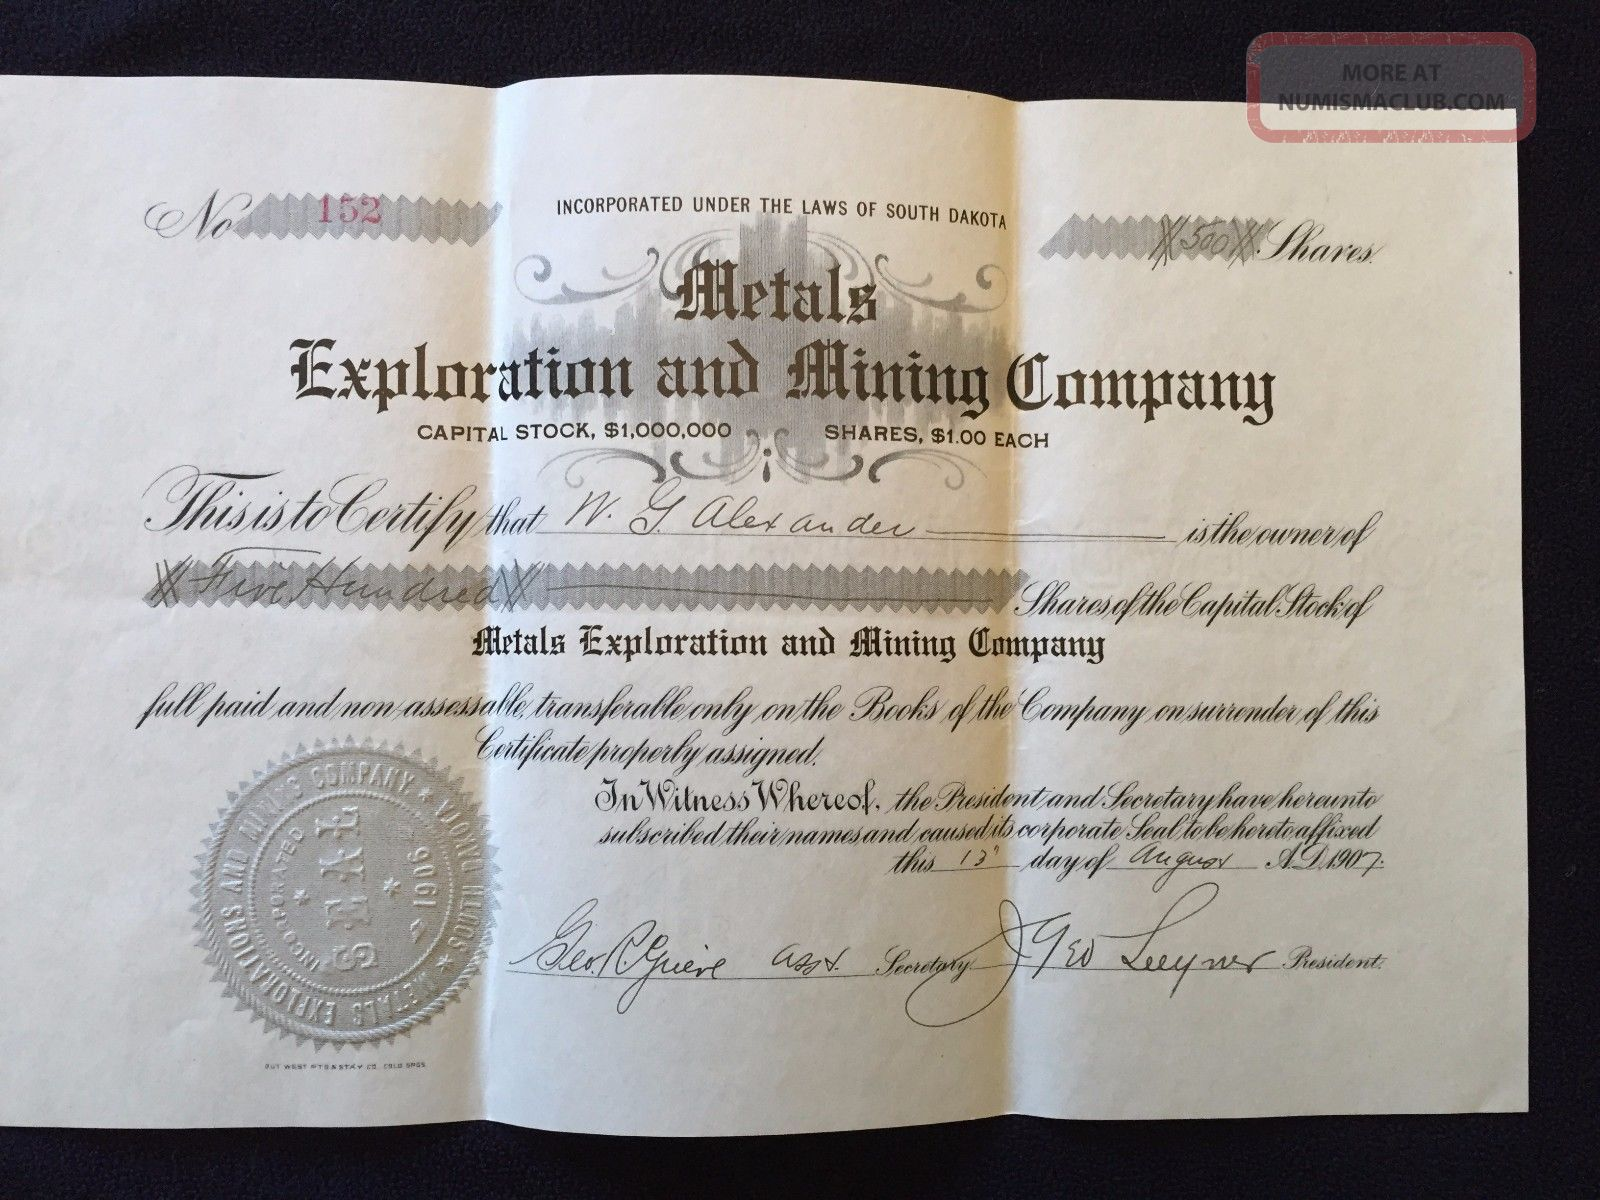 Metals Exploration And Mining Company Stock Certificate Circa 1907 Stocks & Bonds, Scripophily photo